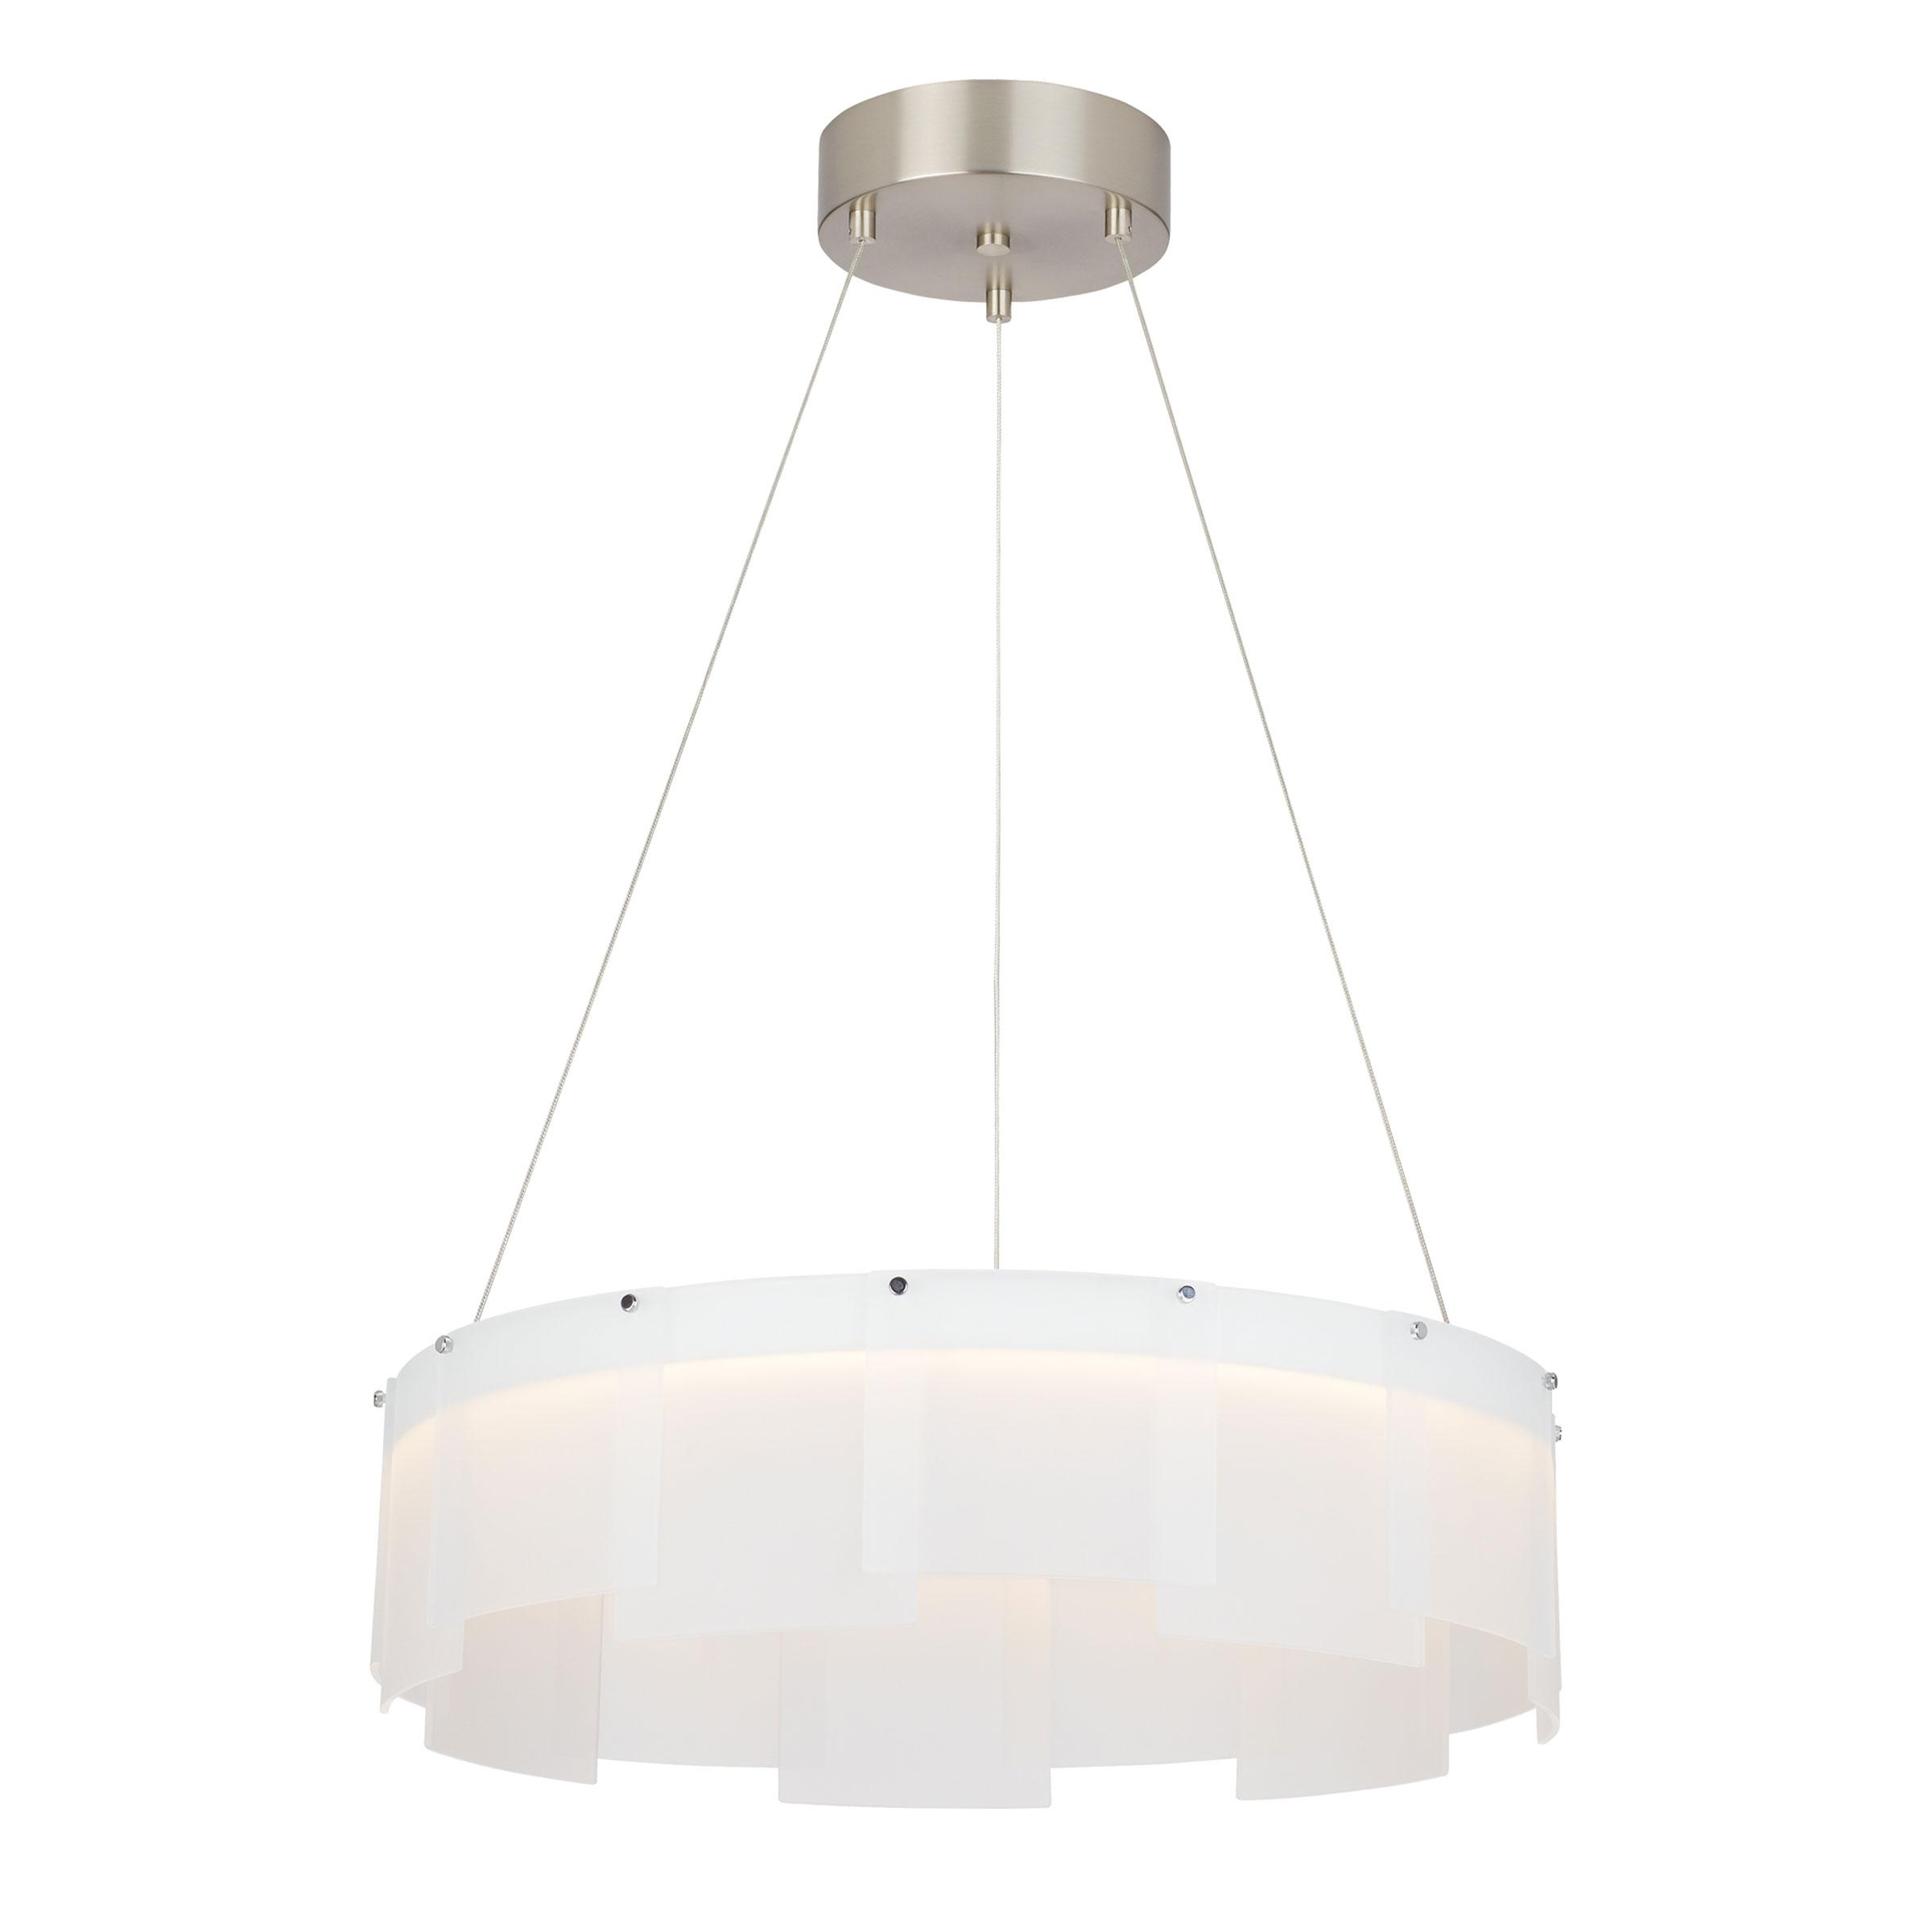 Chandelier by tech lighting 700str24fs led927 stratos chandelier by tech lighting 700str24fs led927 aloadofball Gallery